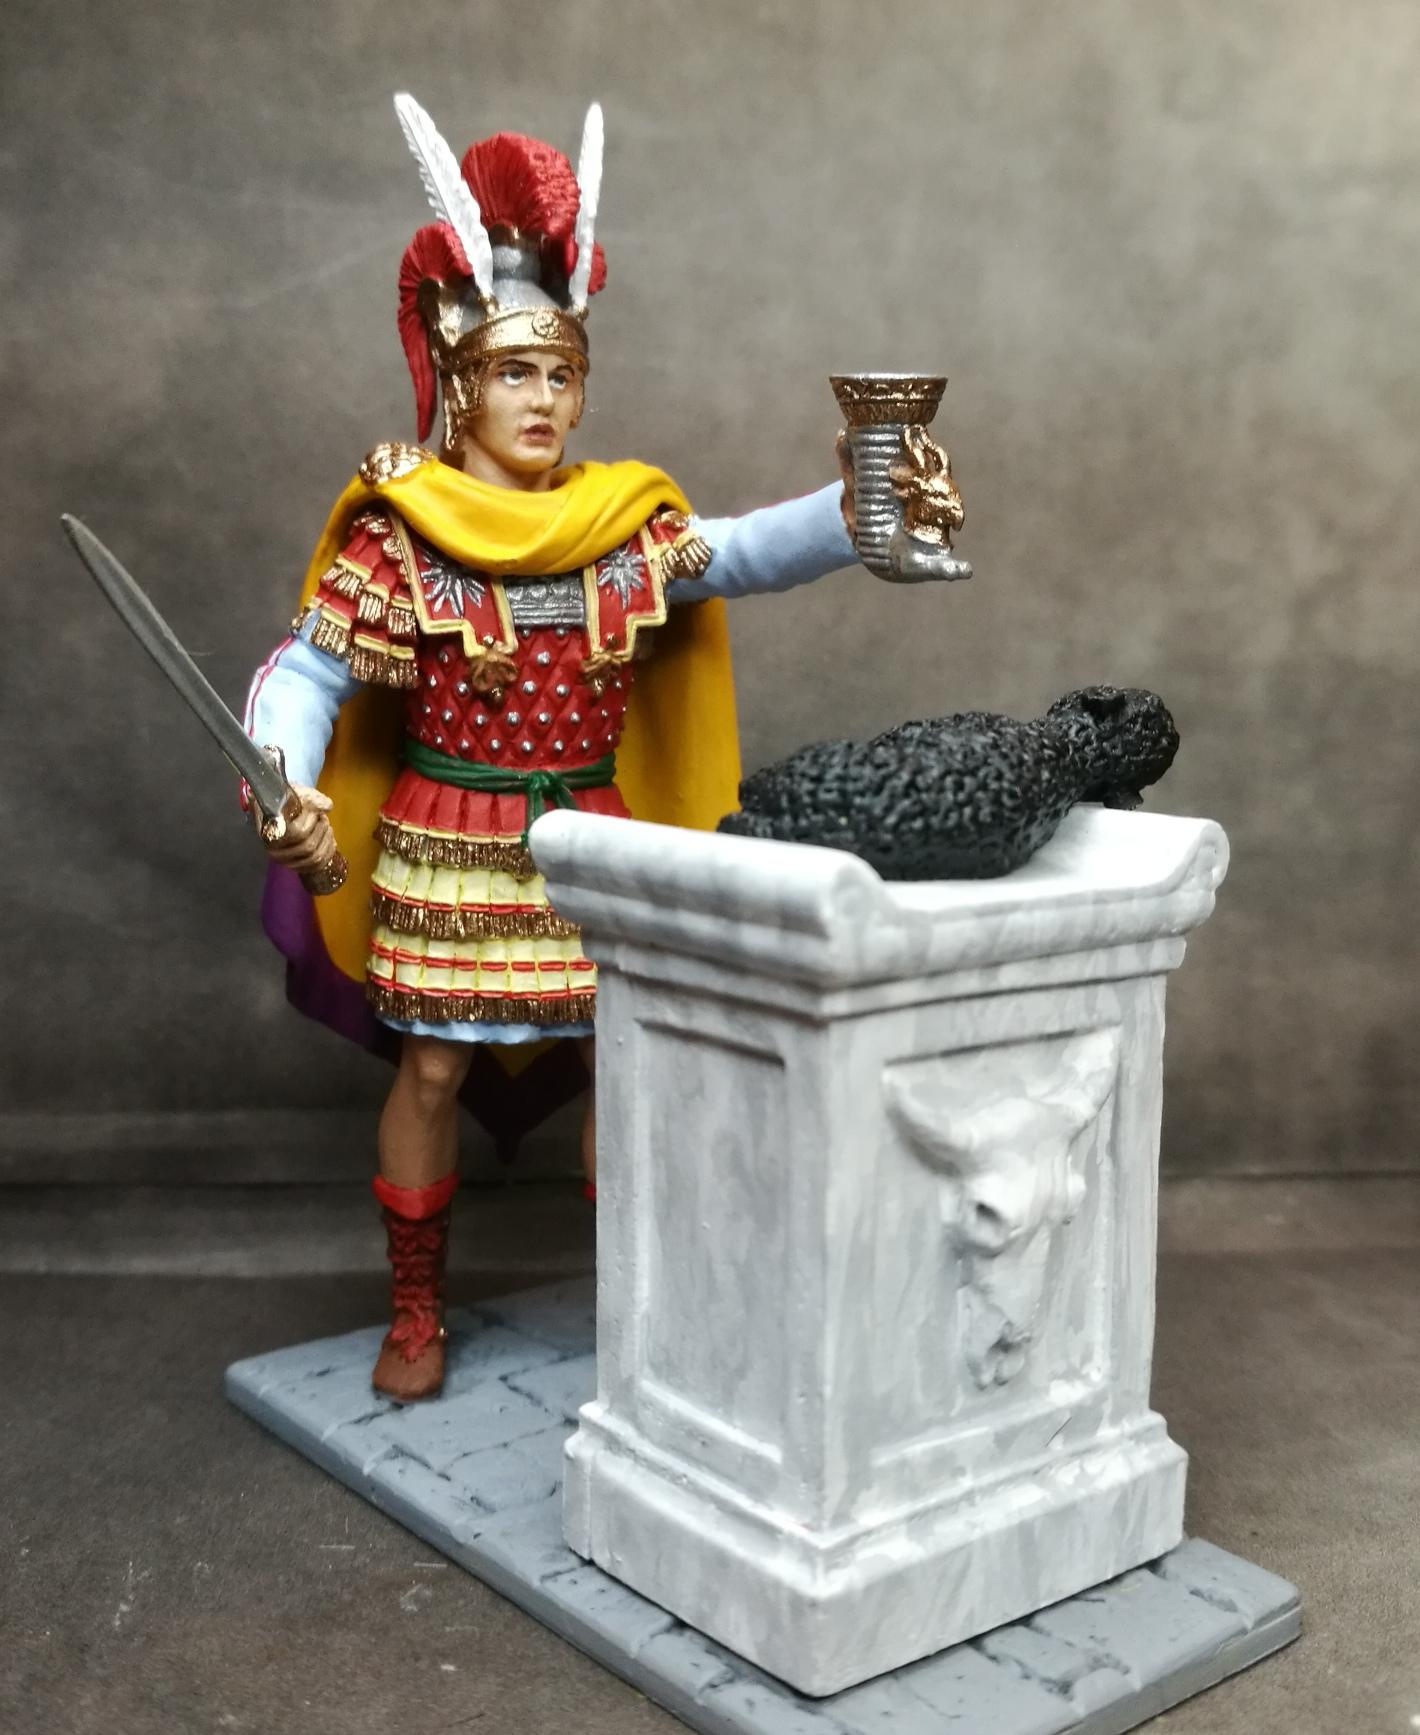 Alexander The Great, Macedon,  King , Μεγας  Αλεξανδρος, Μακεδων, Μακεδονια